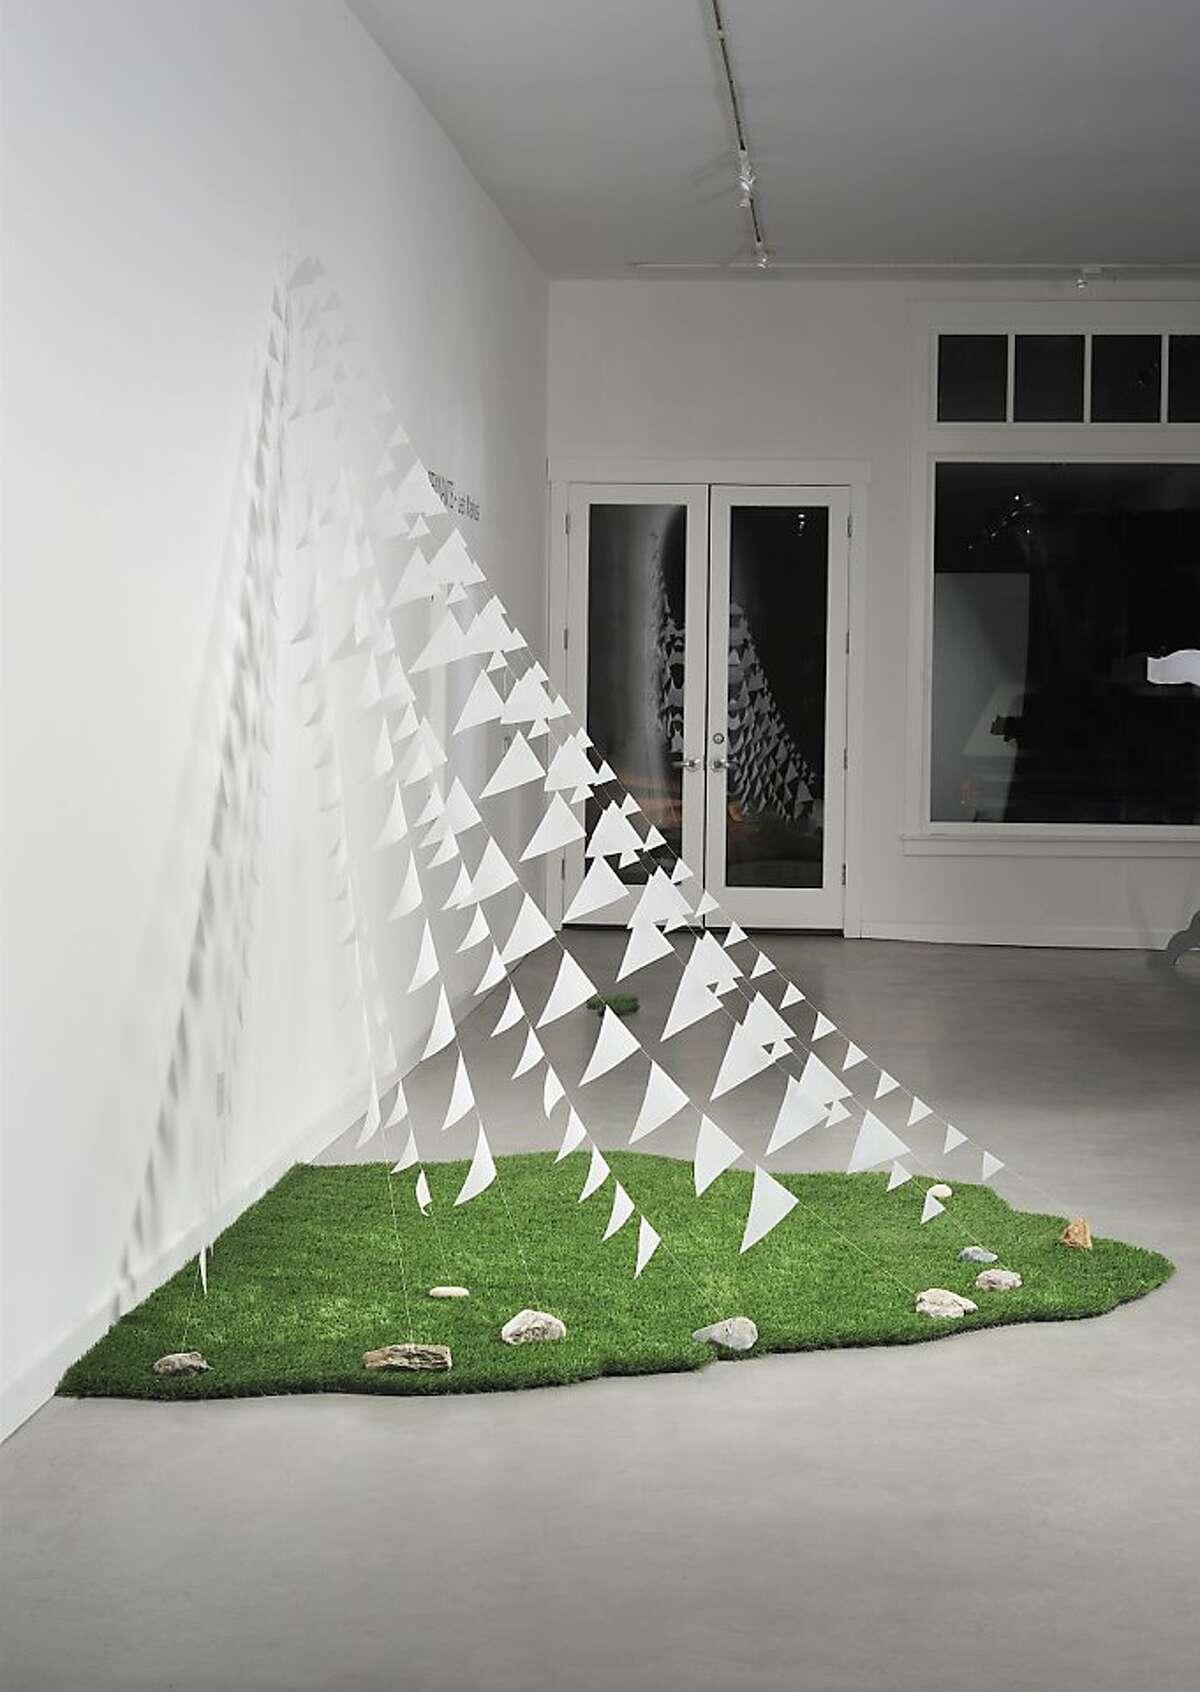 Leah Markos' Pennants Alcove vellum (archival), faux lawn, stones 114 w x 93 d x approx 9 ft h2013